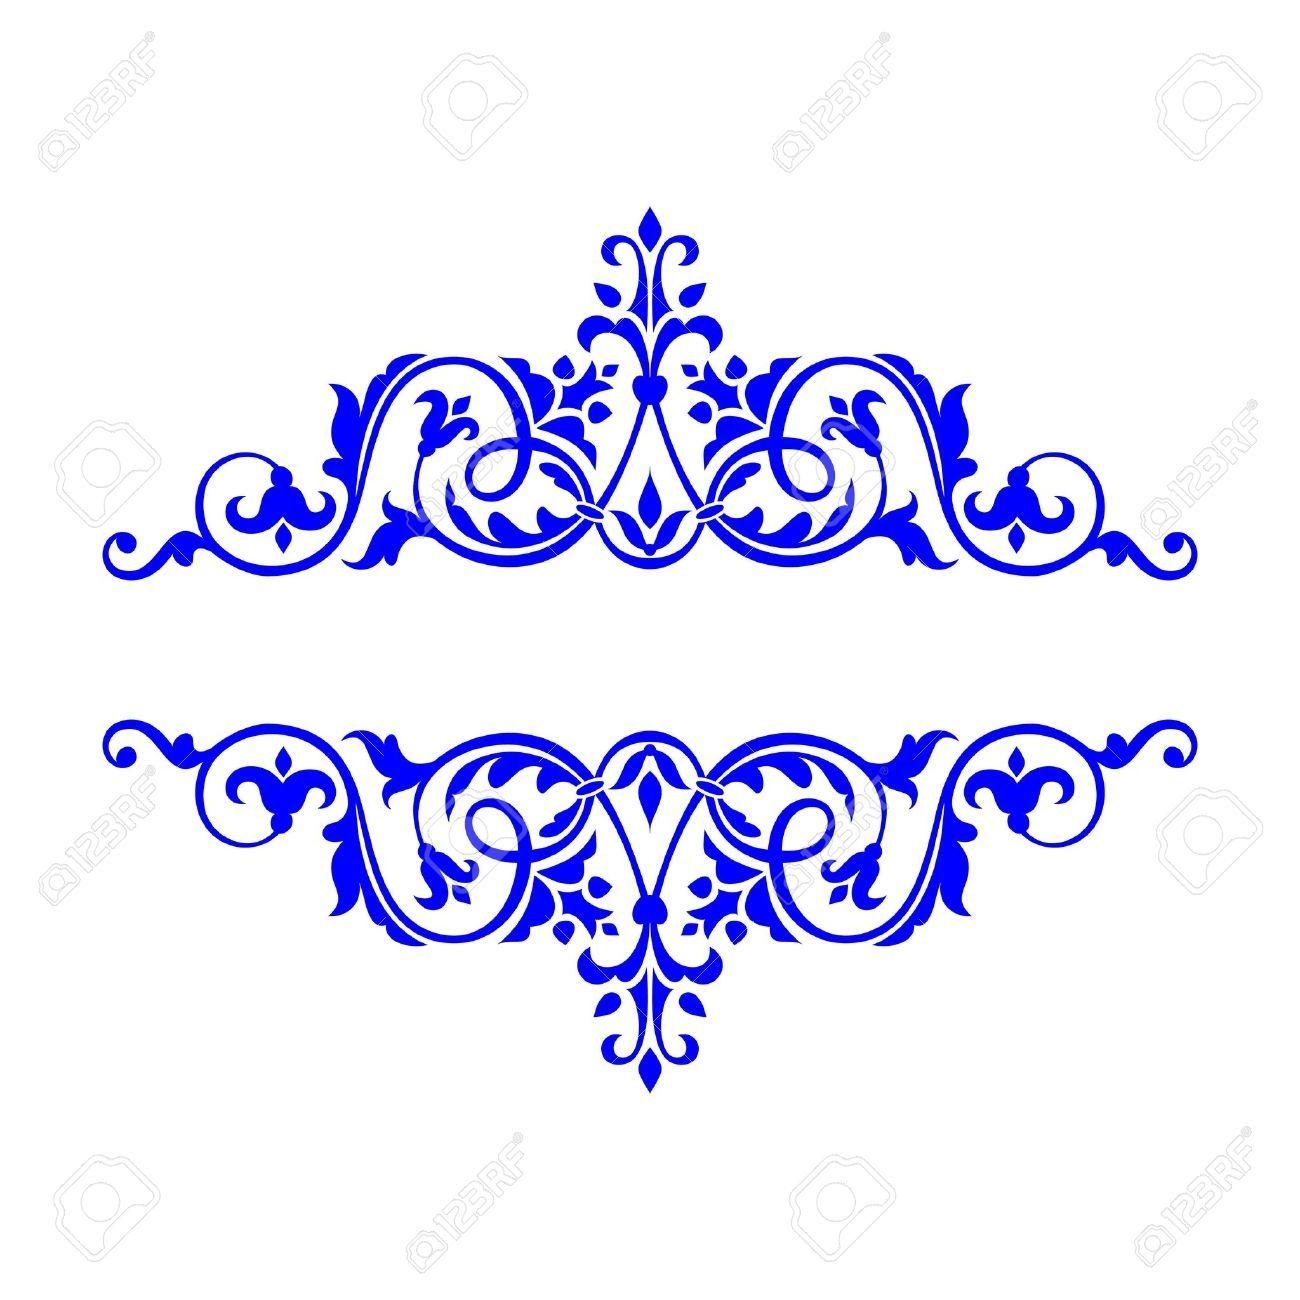 royal blue border design - Boat.jeremyeaton.co